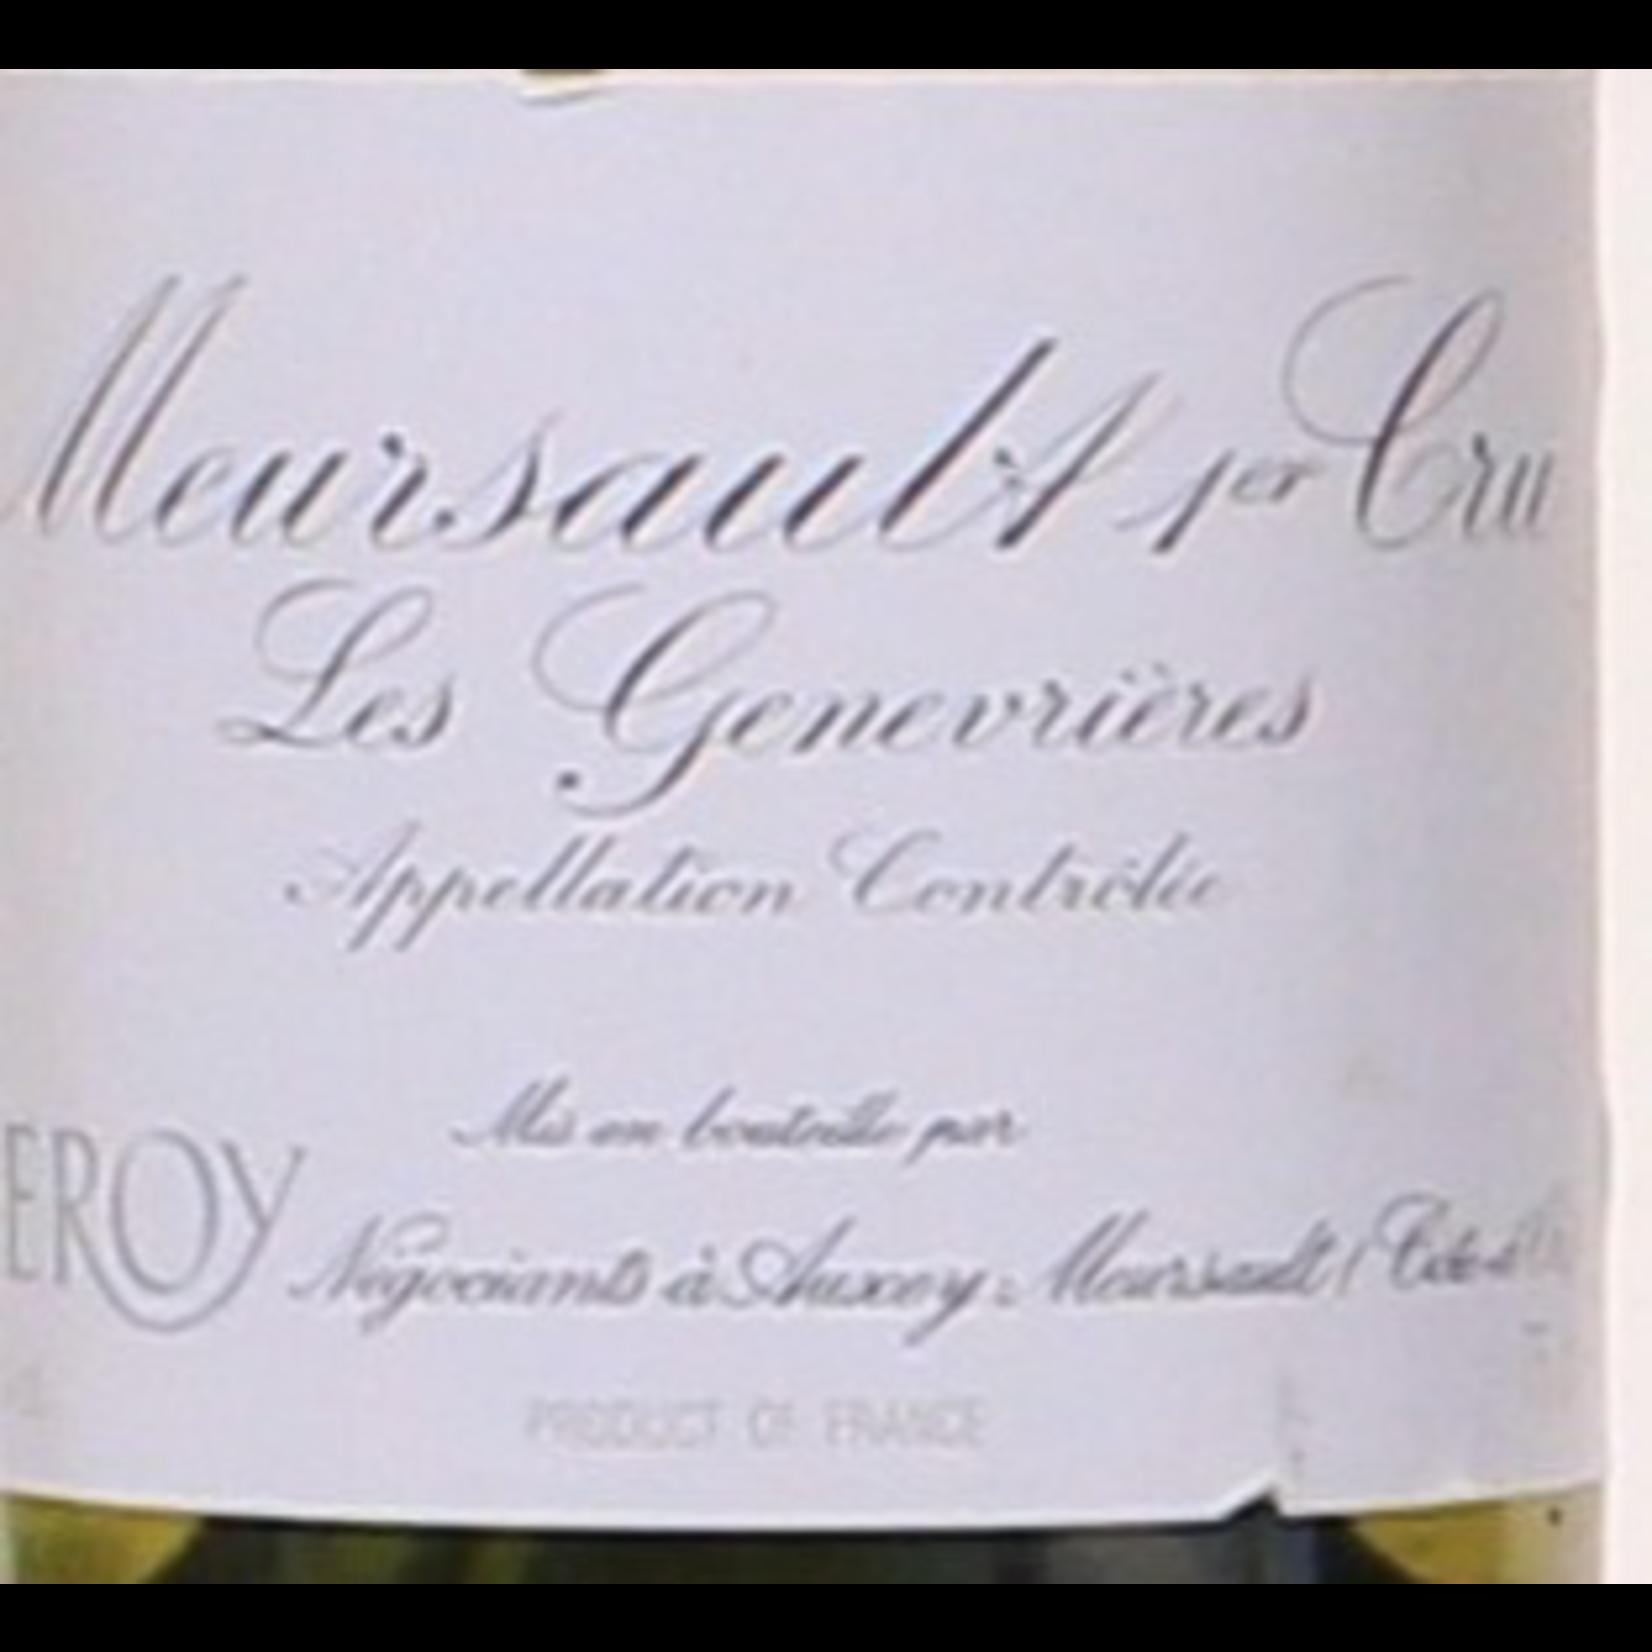 Domaine Leroy Meursault Genevrieres Premier Cru 1985